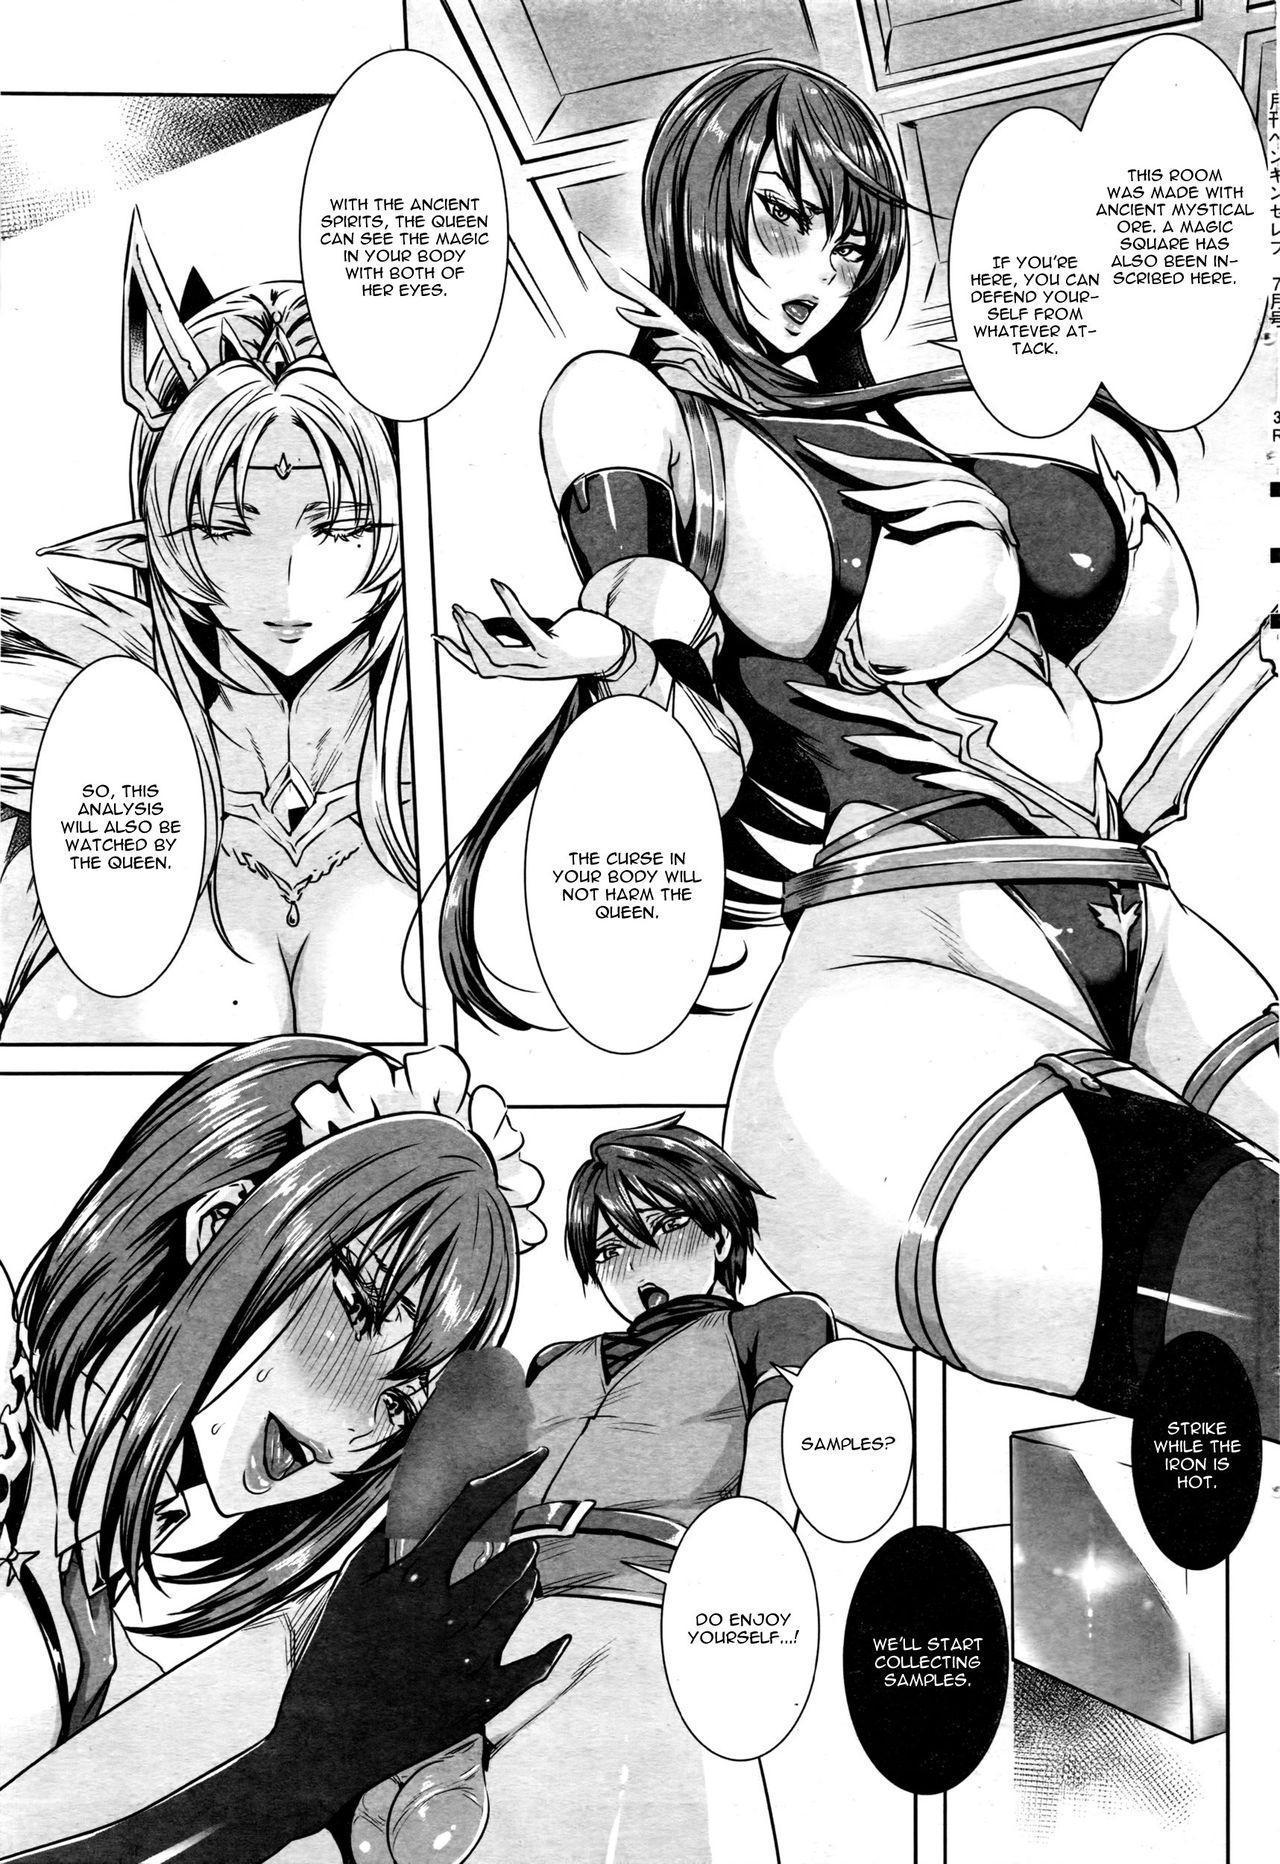 Ippai Itte ne, Yuusha-sama   Please Cum Lots ♪ Lord Hero ♥ 5